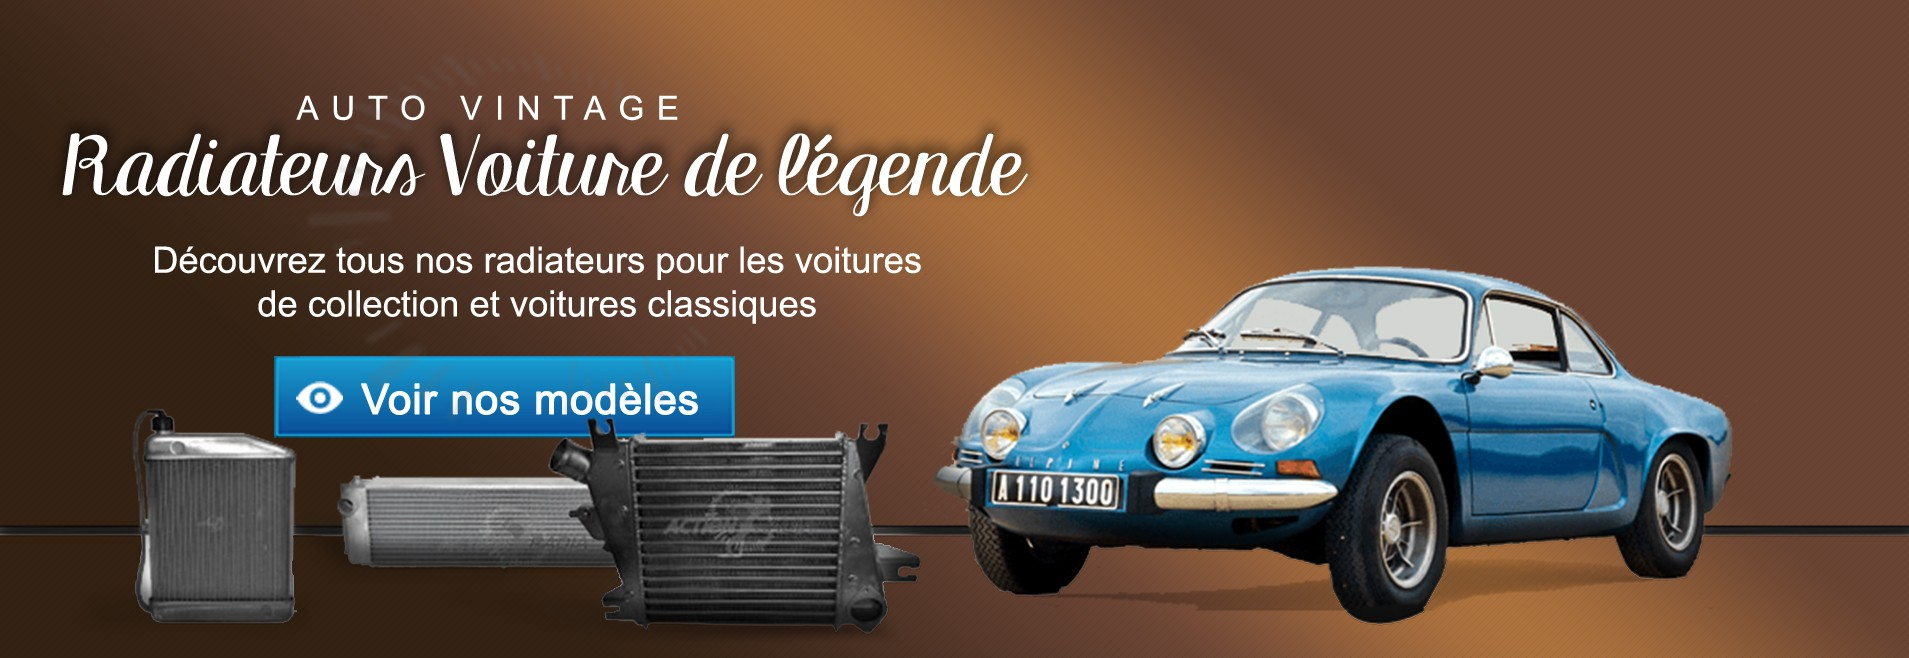 radiateur-voitures-legende